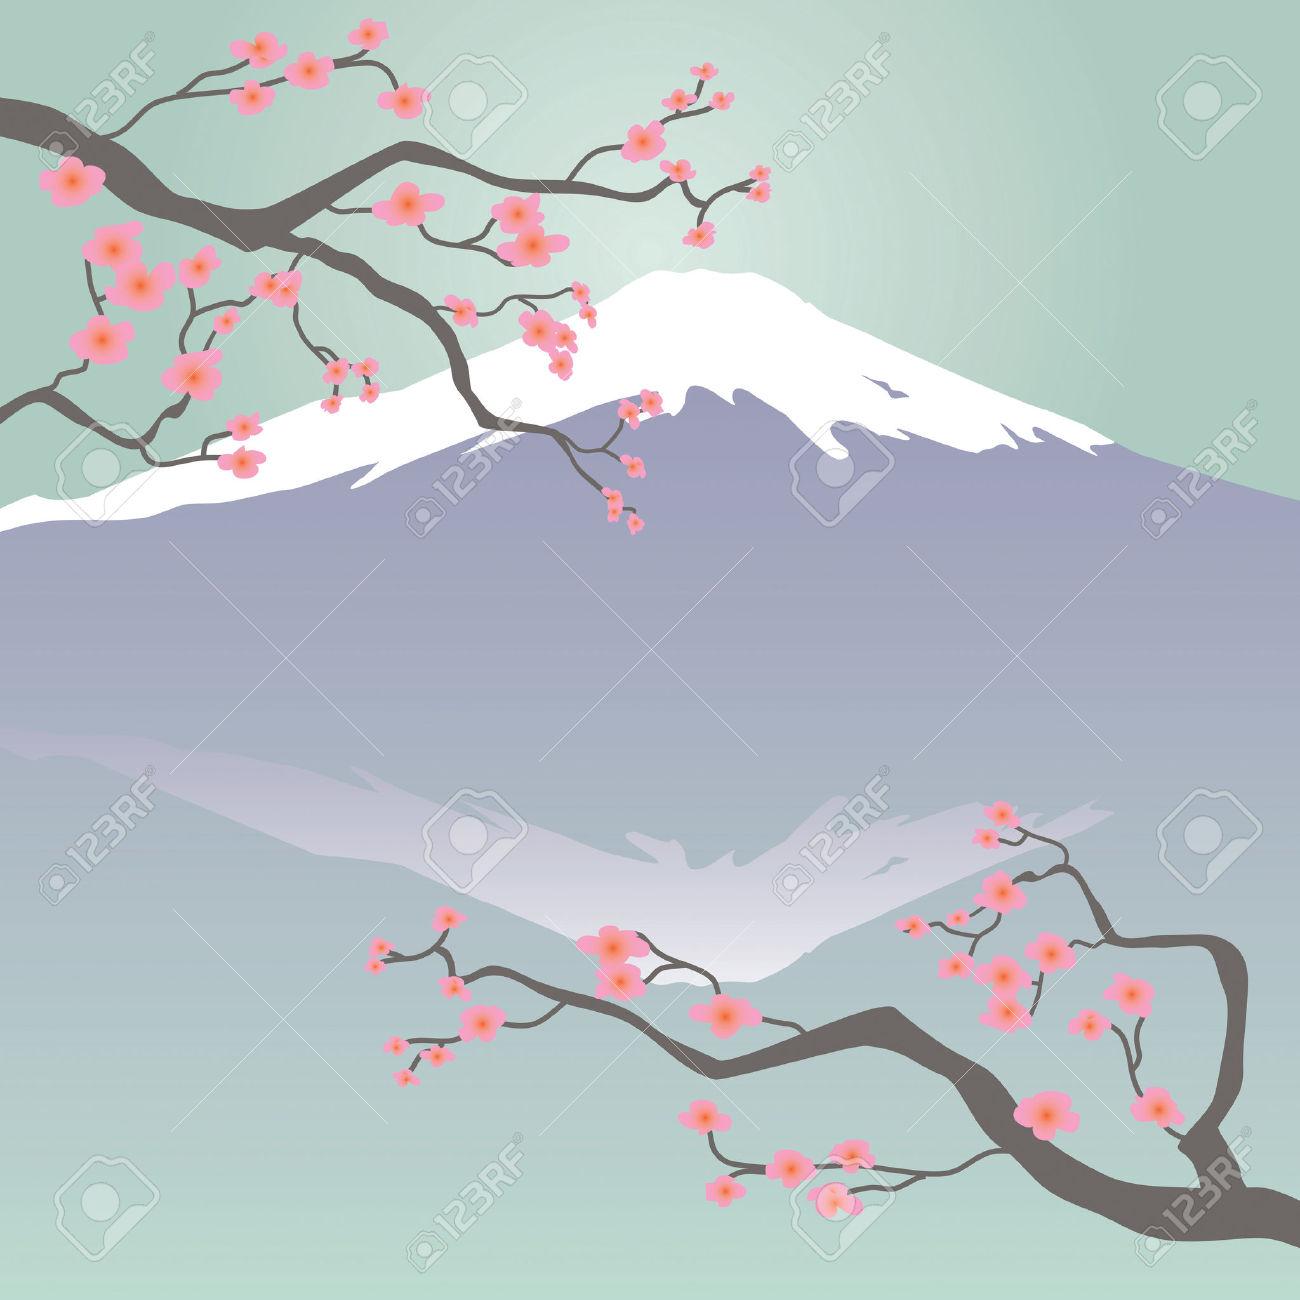 Mount Fuji clipart #10, Download drawings